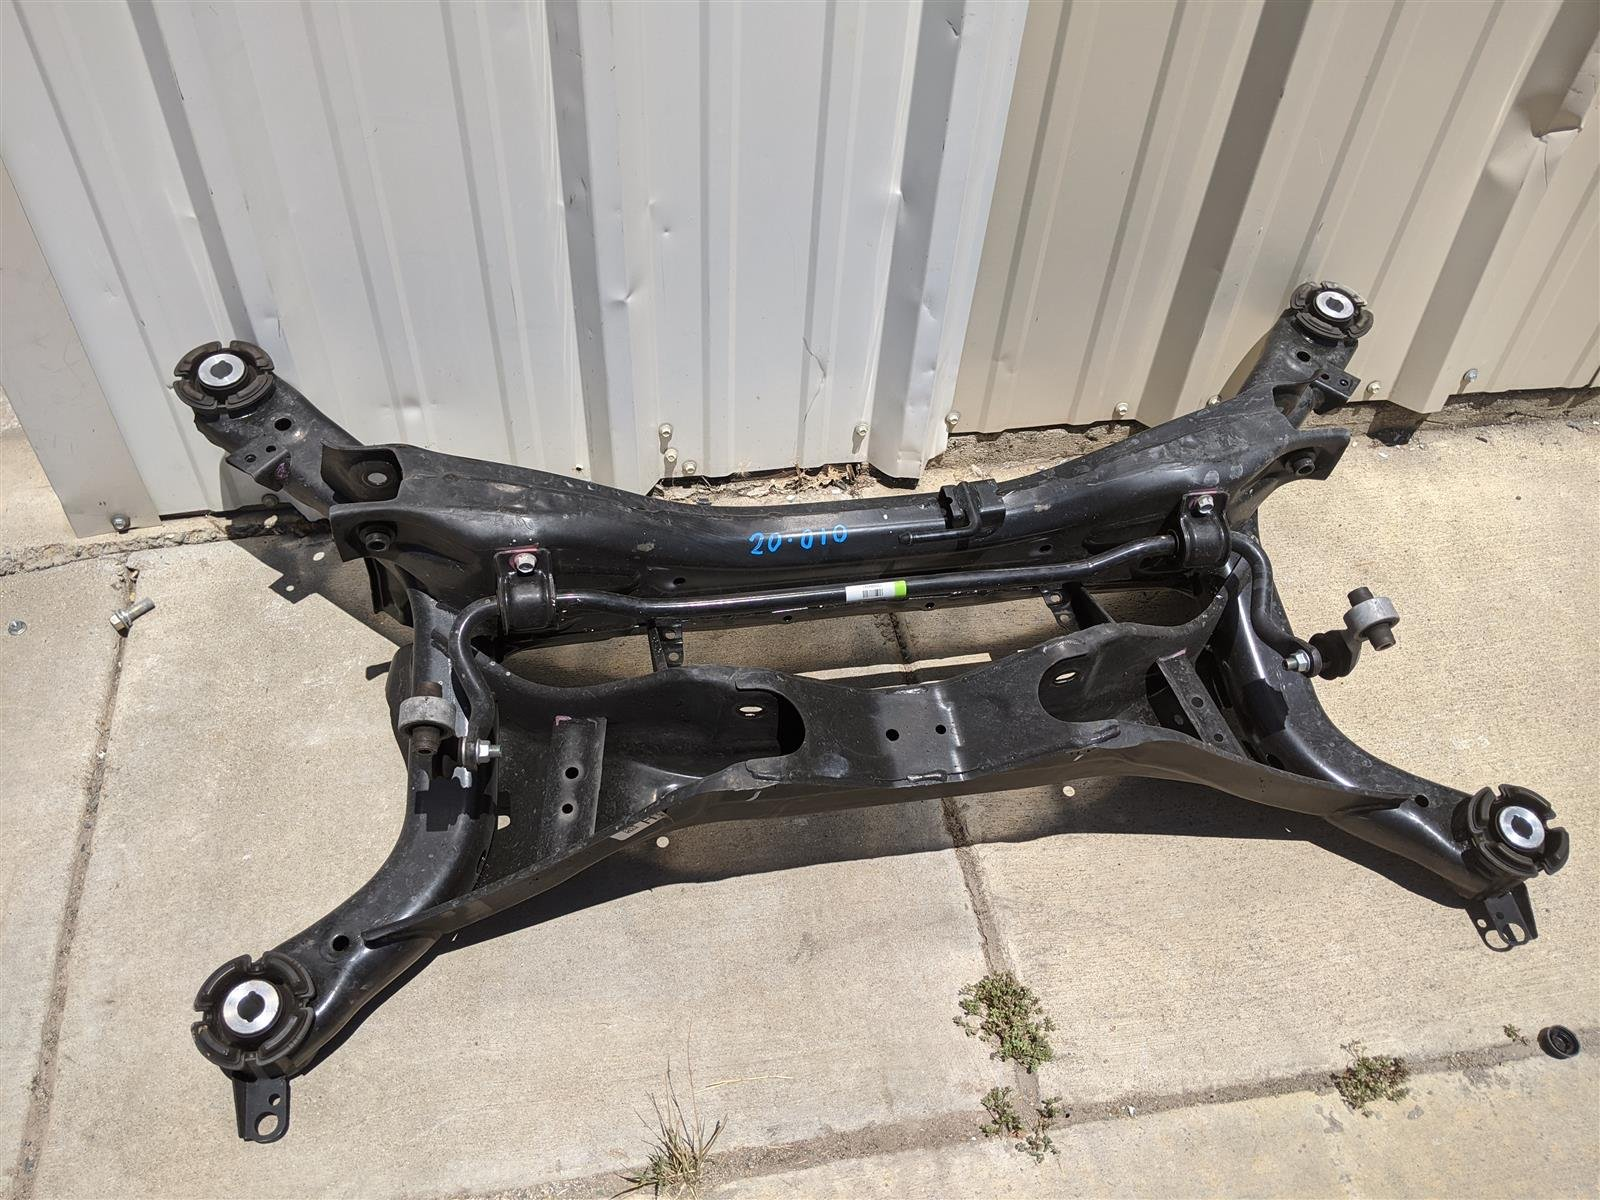 2018 Honda Accord Rear Subframe Beam Replacement